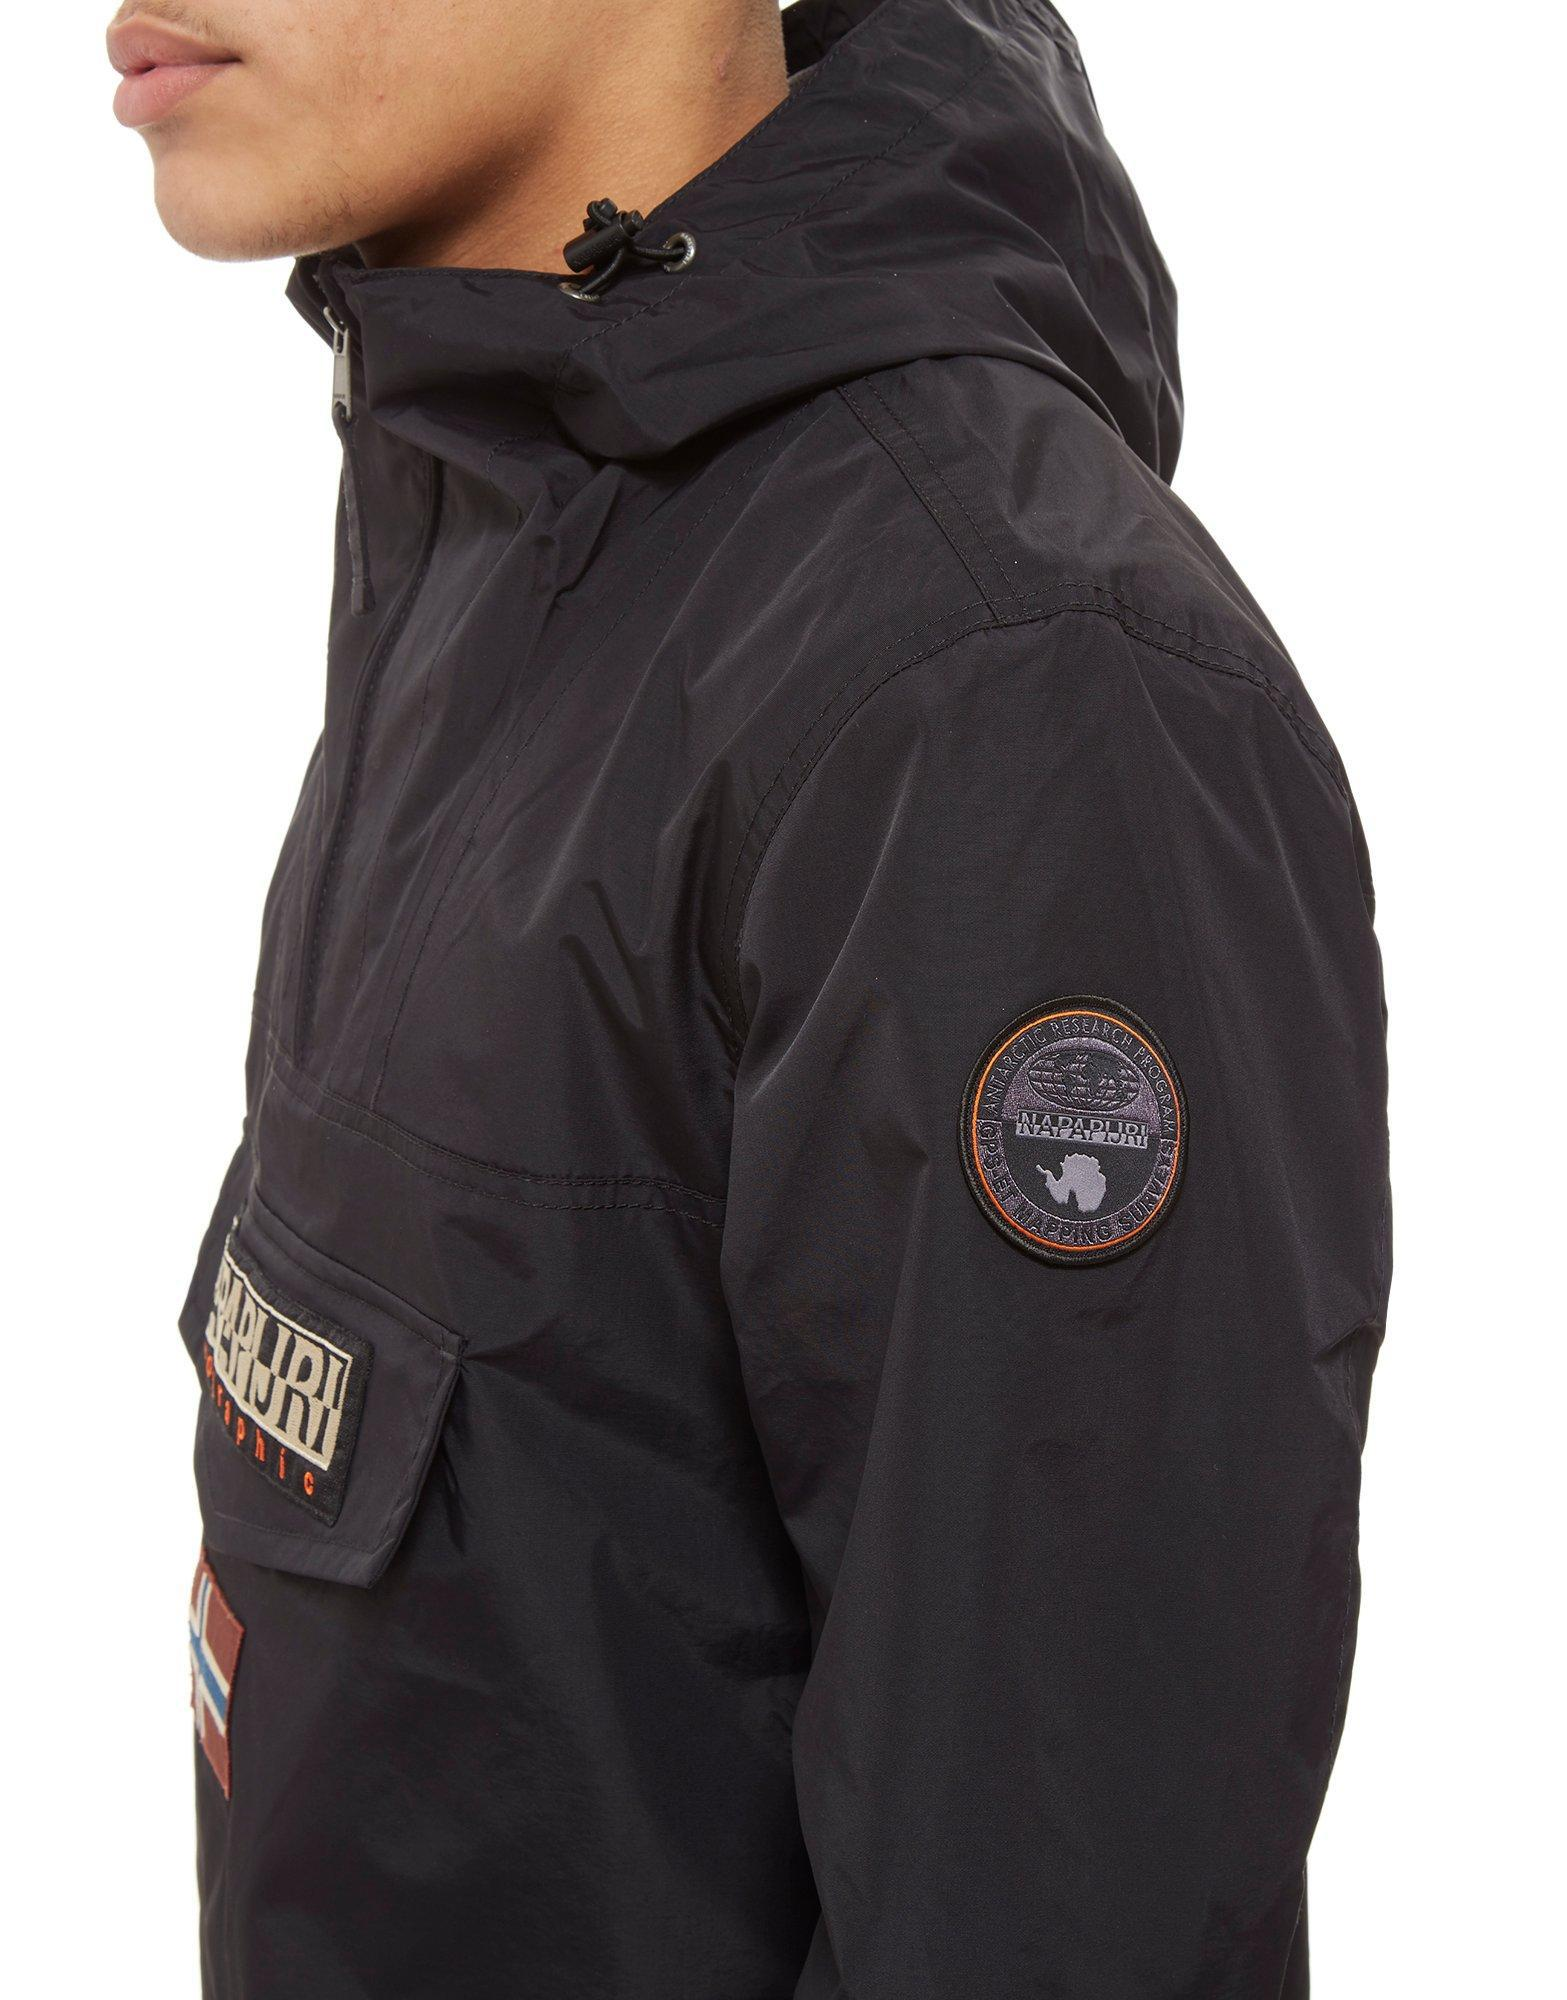 Napapijri Synthetic Rainforest Lightweight Jacket in Black for Men